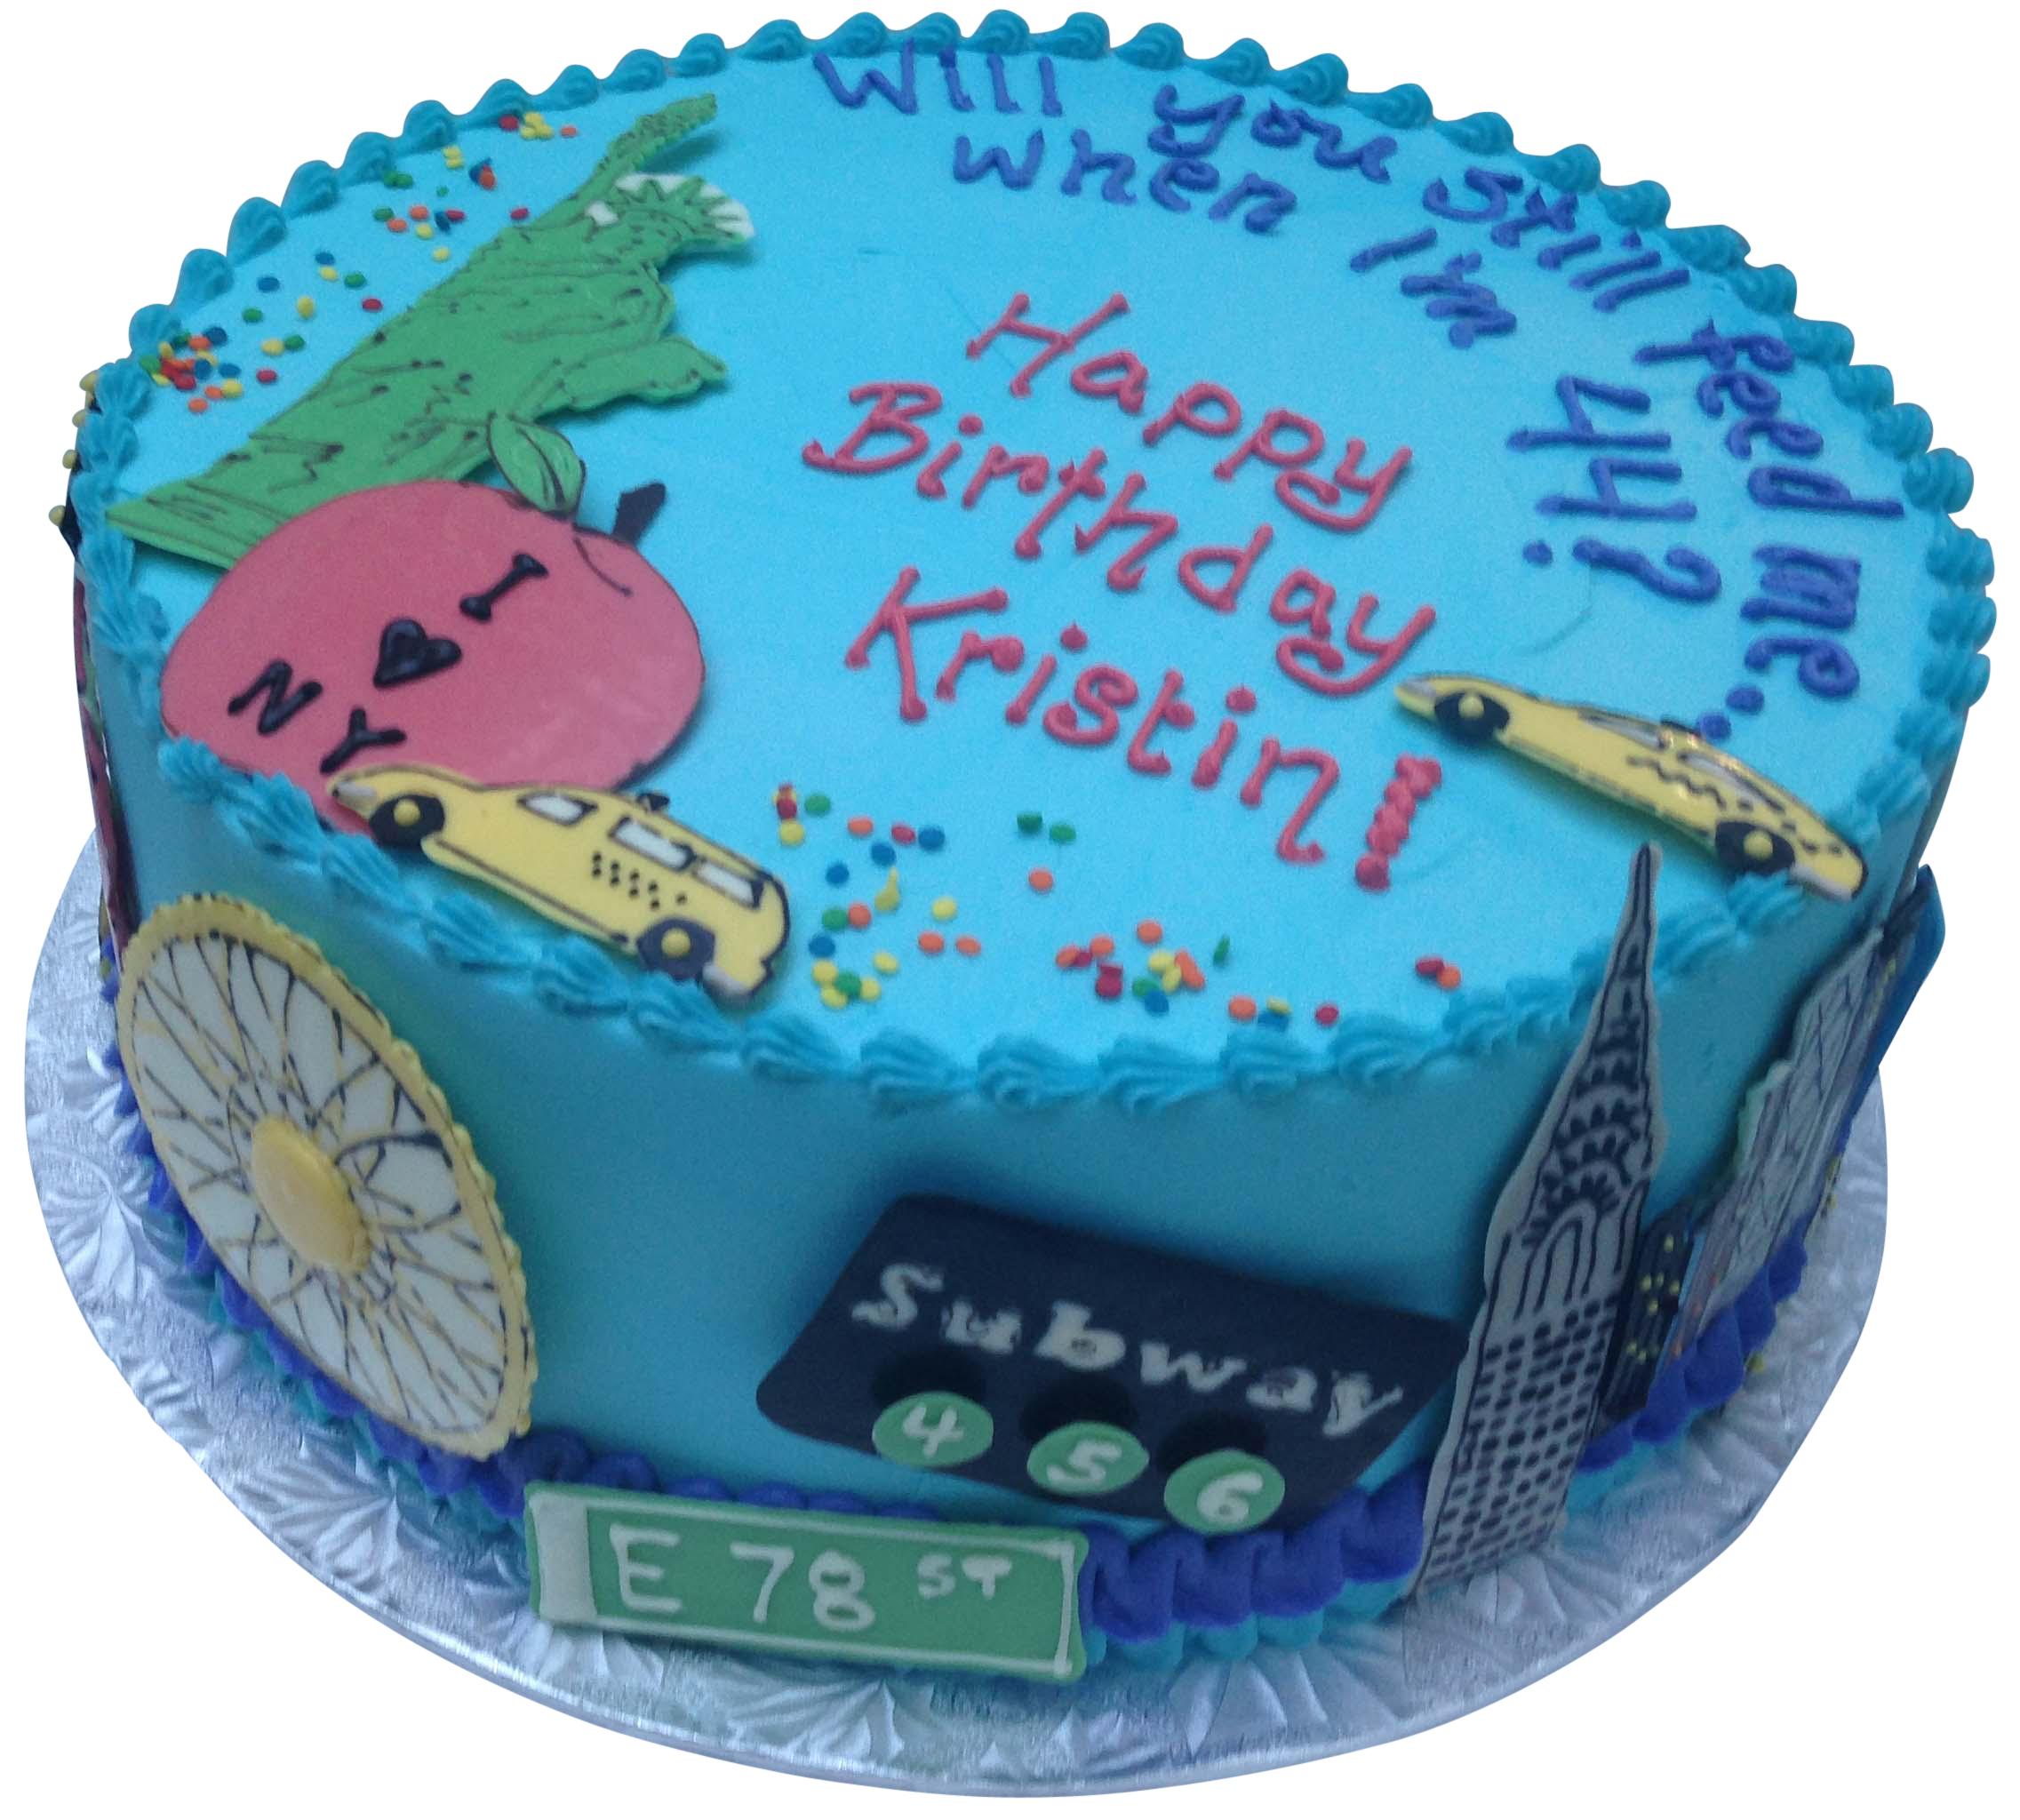 BeBe-Cakes-NYC-Birthday-Cake.jpg